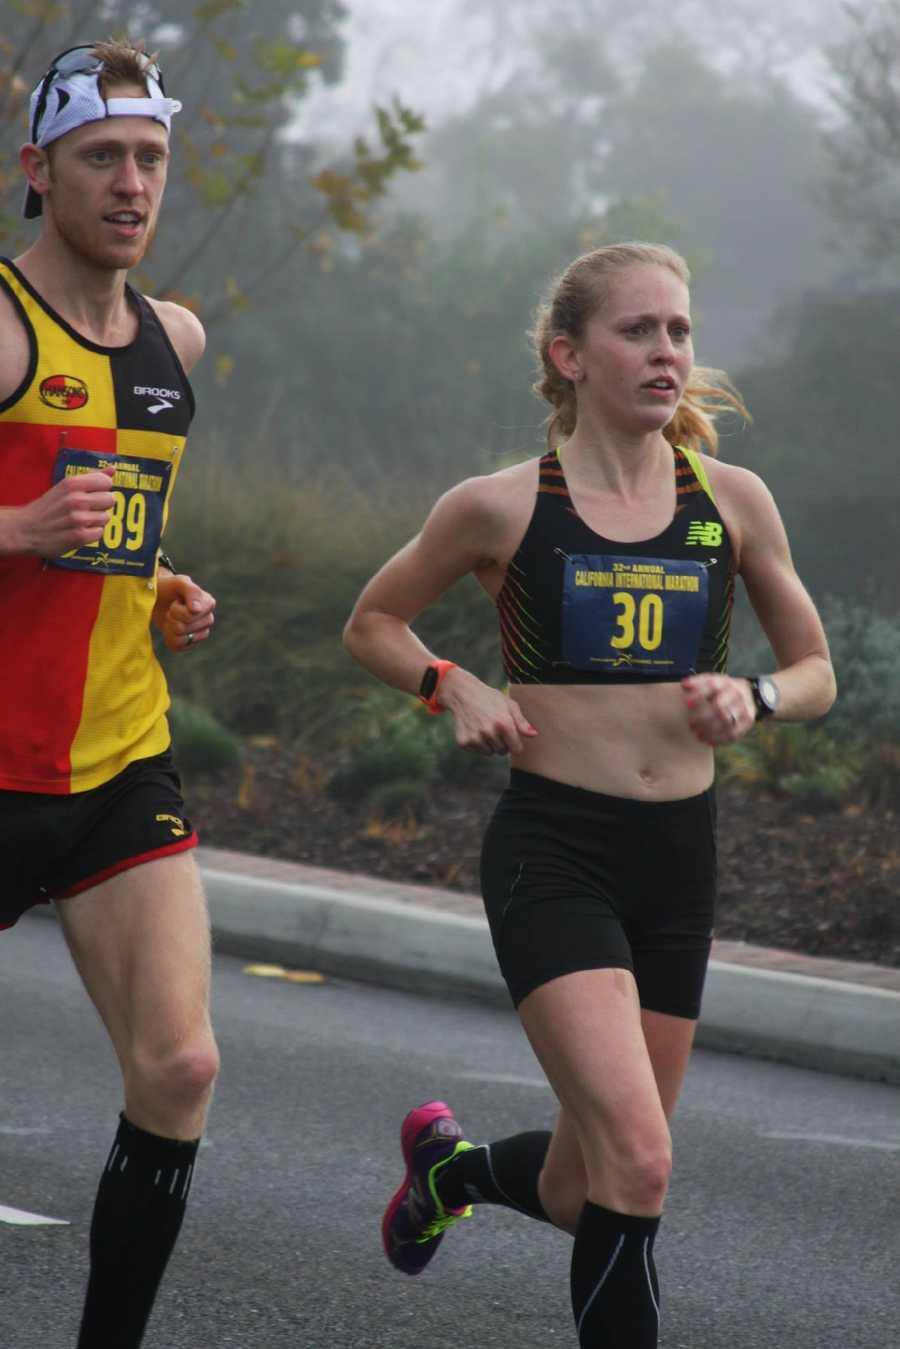 Brendan paced Kaitlin at the 2014 California International Marathon, where she qualified for the 2016 U.S. Marathon Trials.